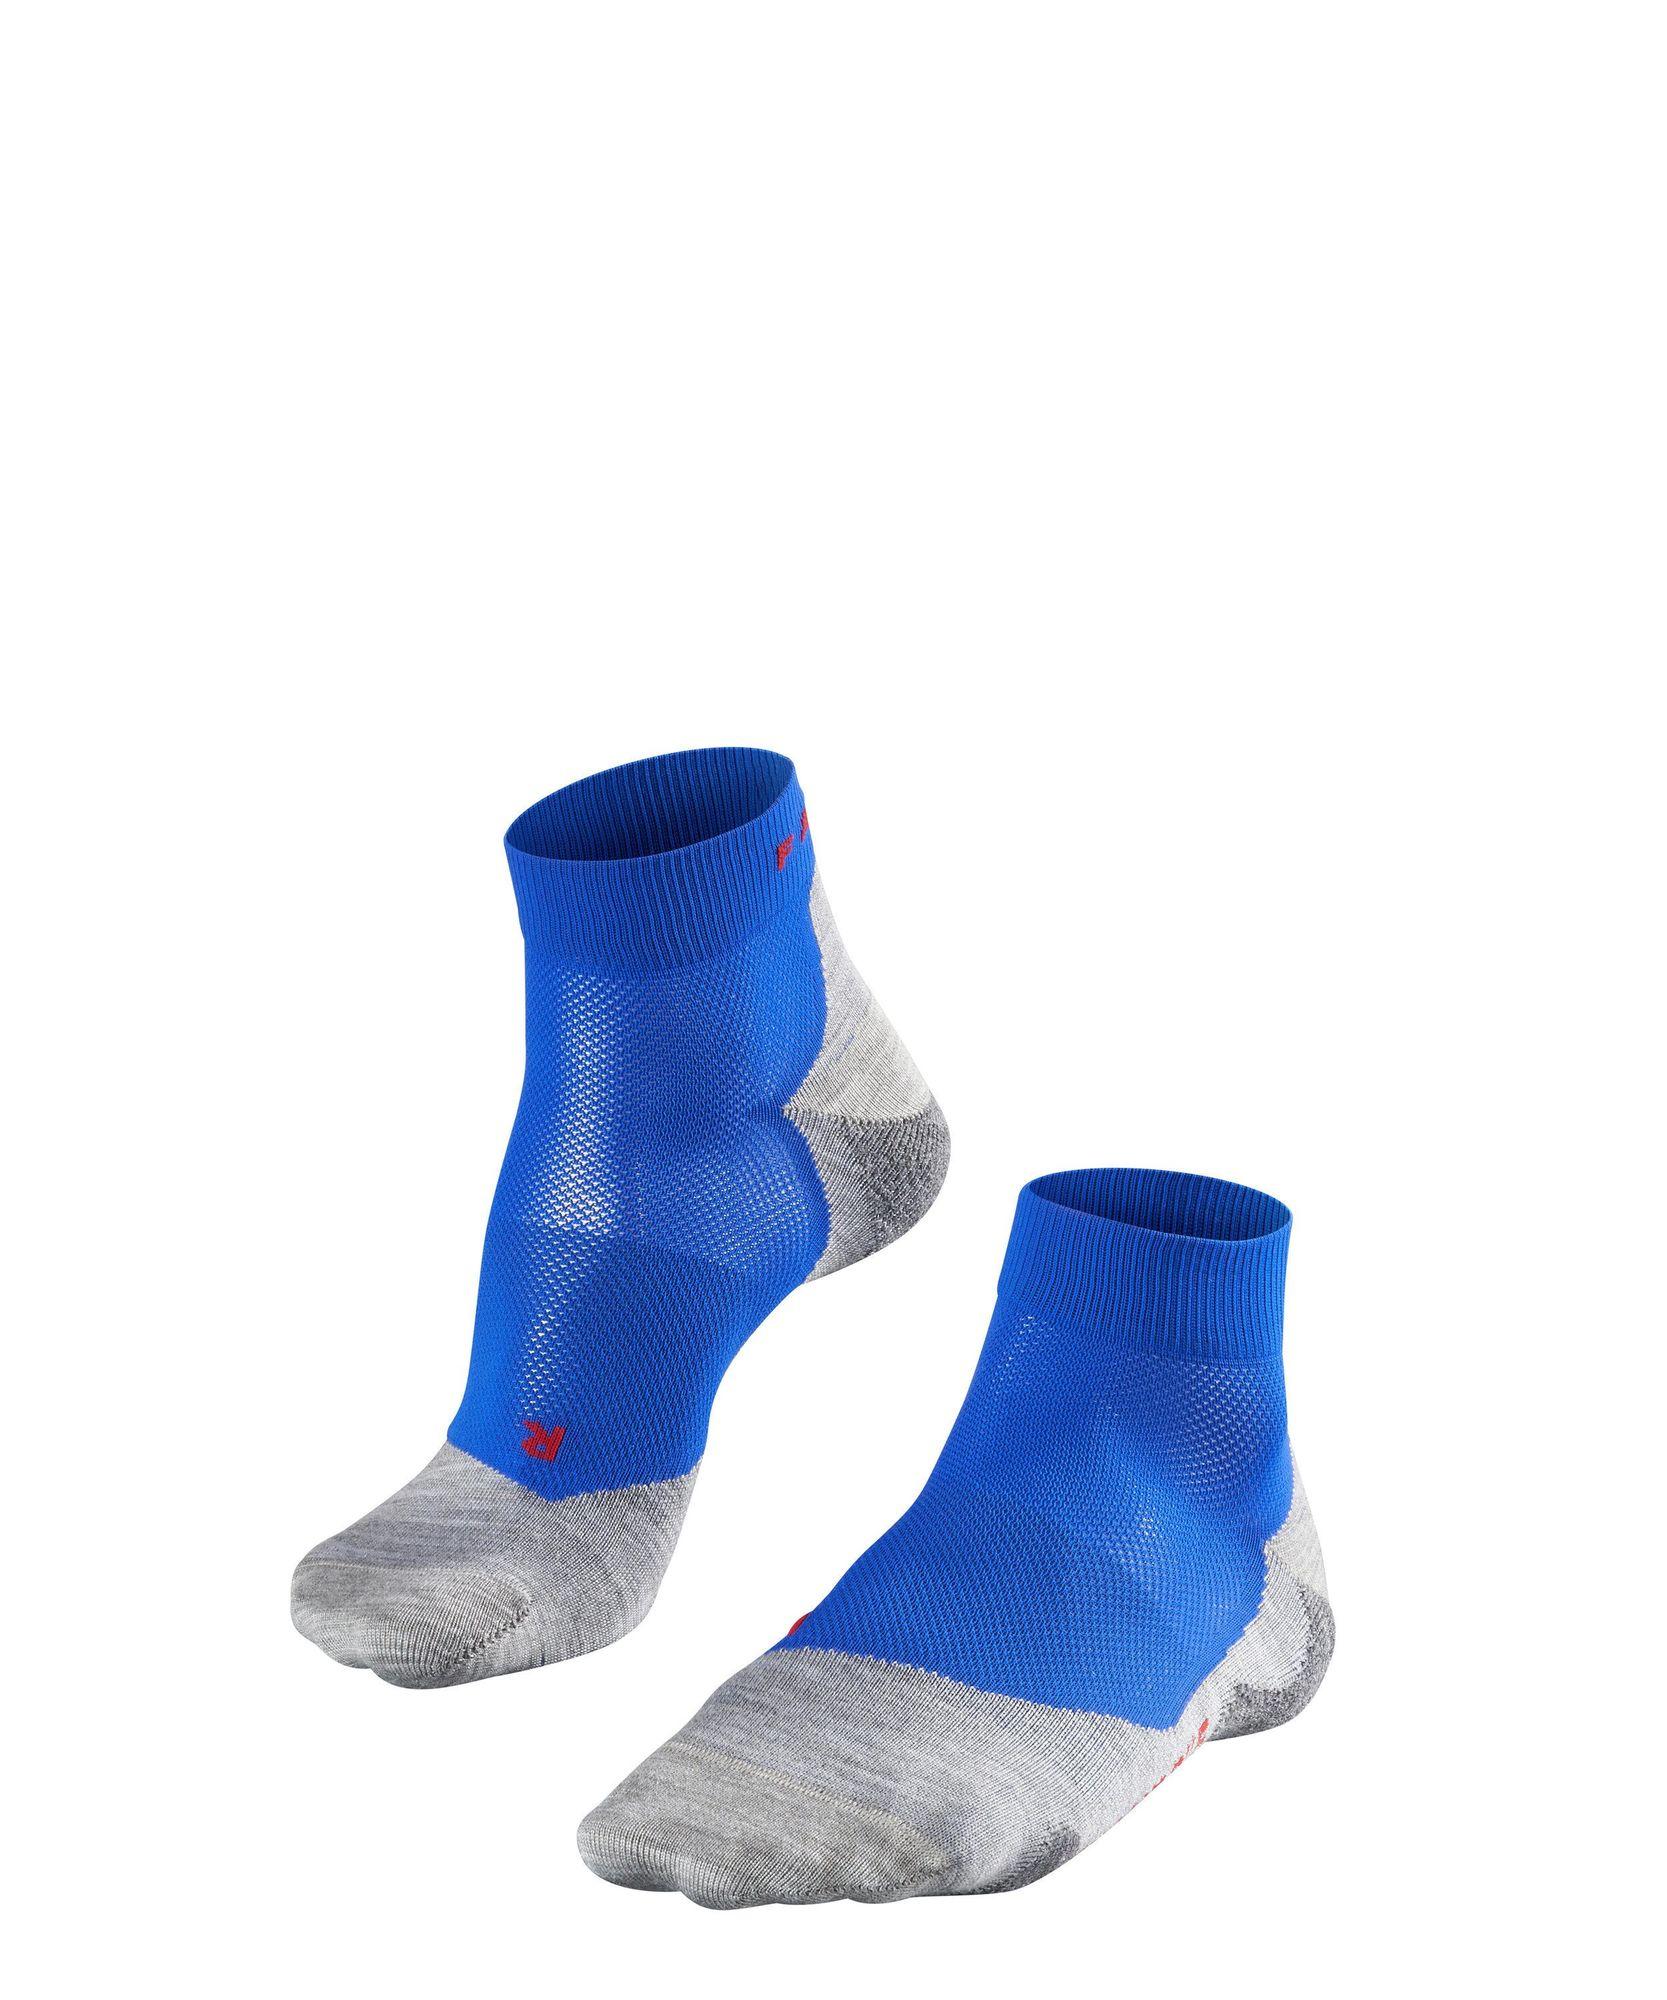 Falke RU5 Short (Blau)